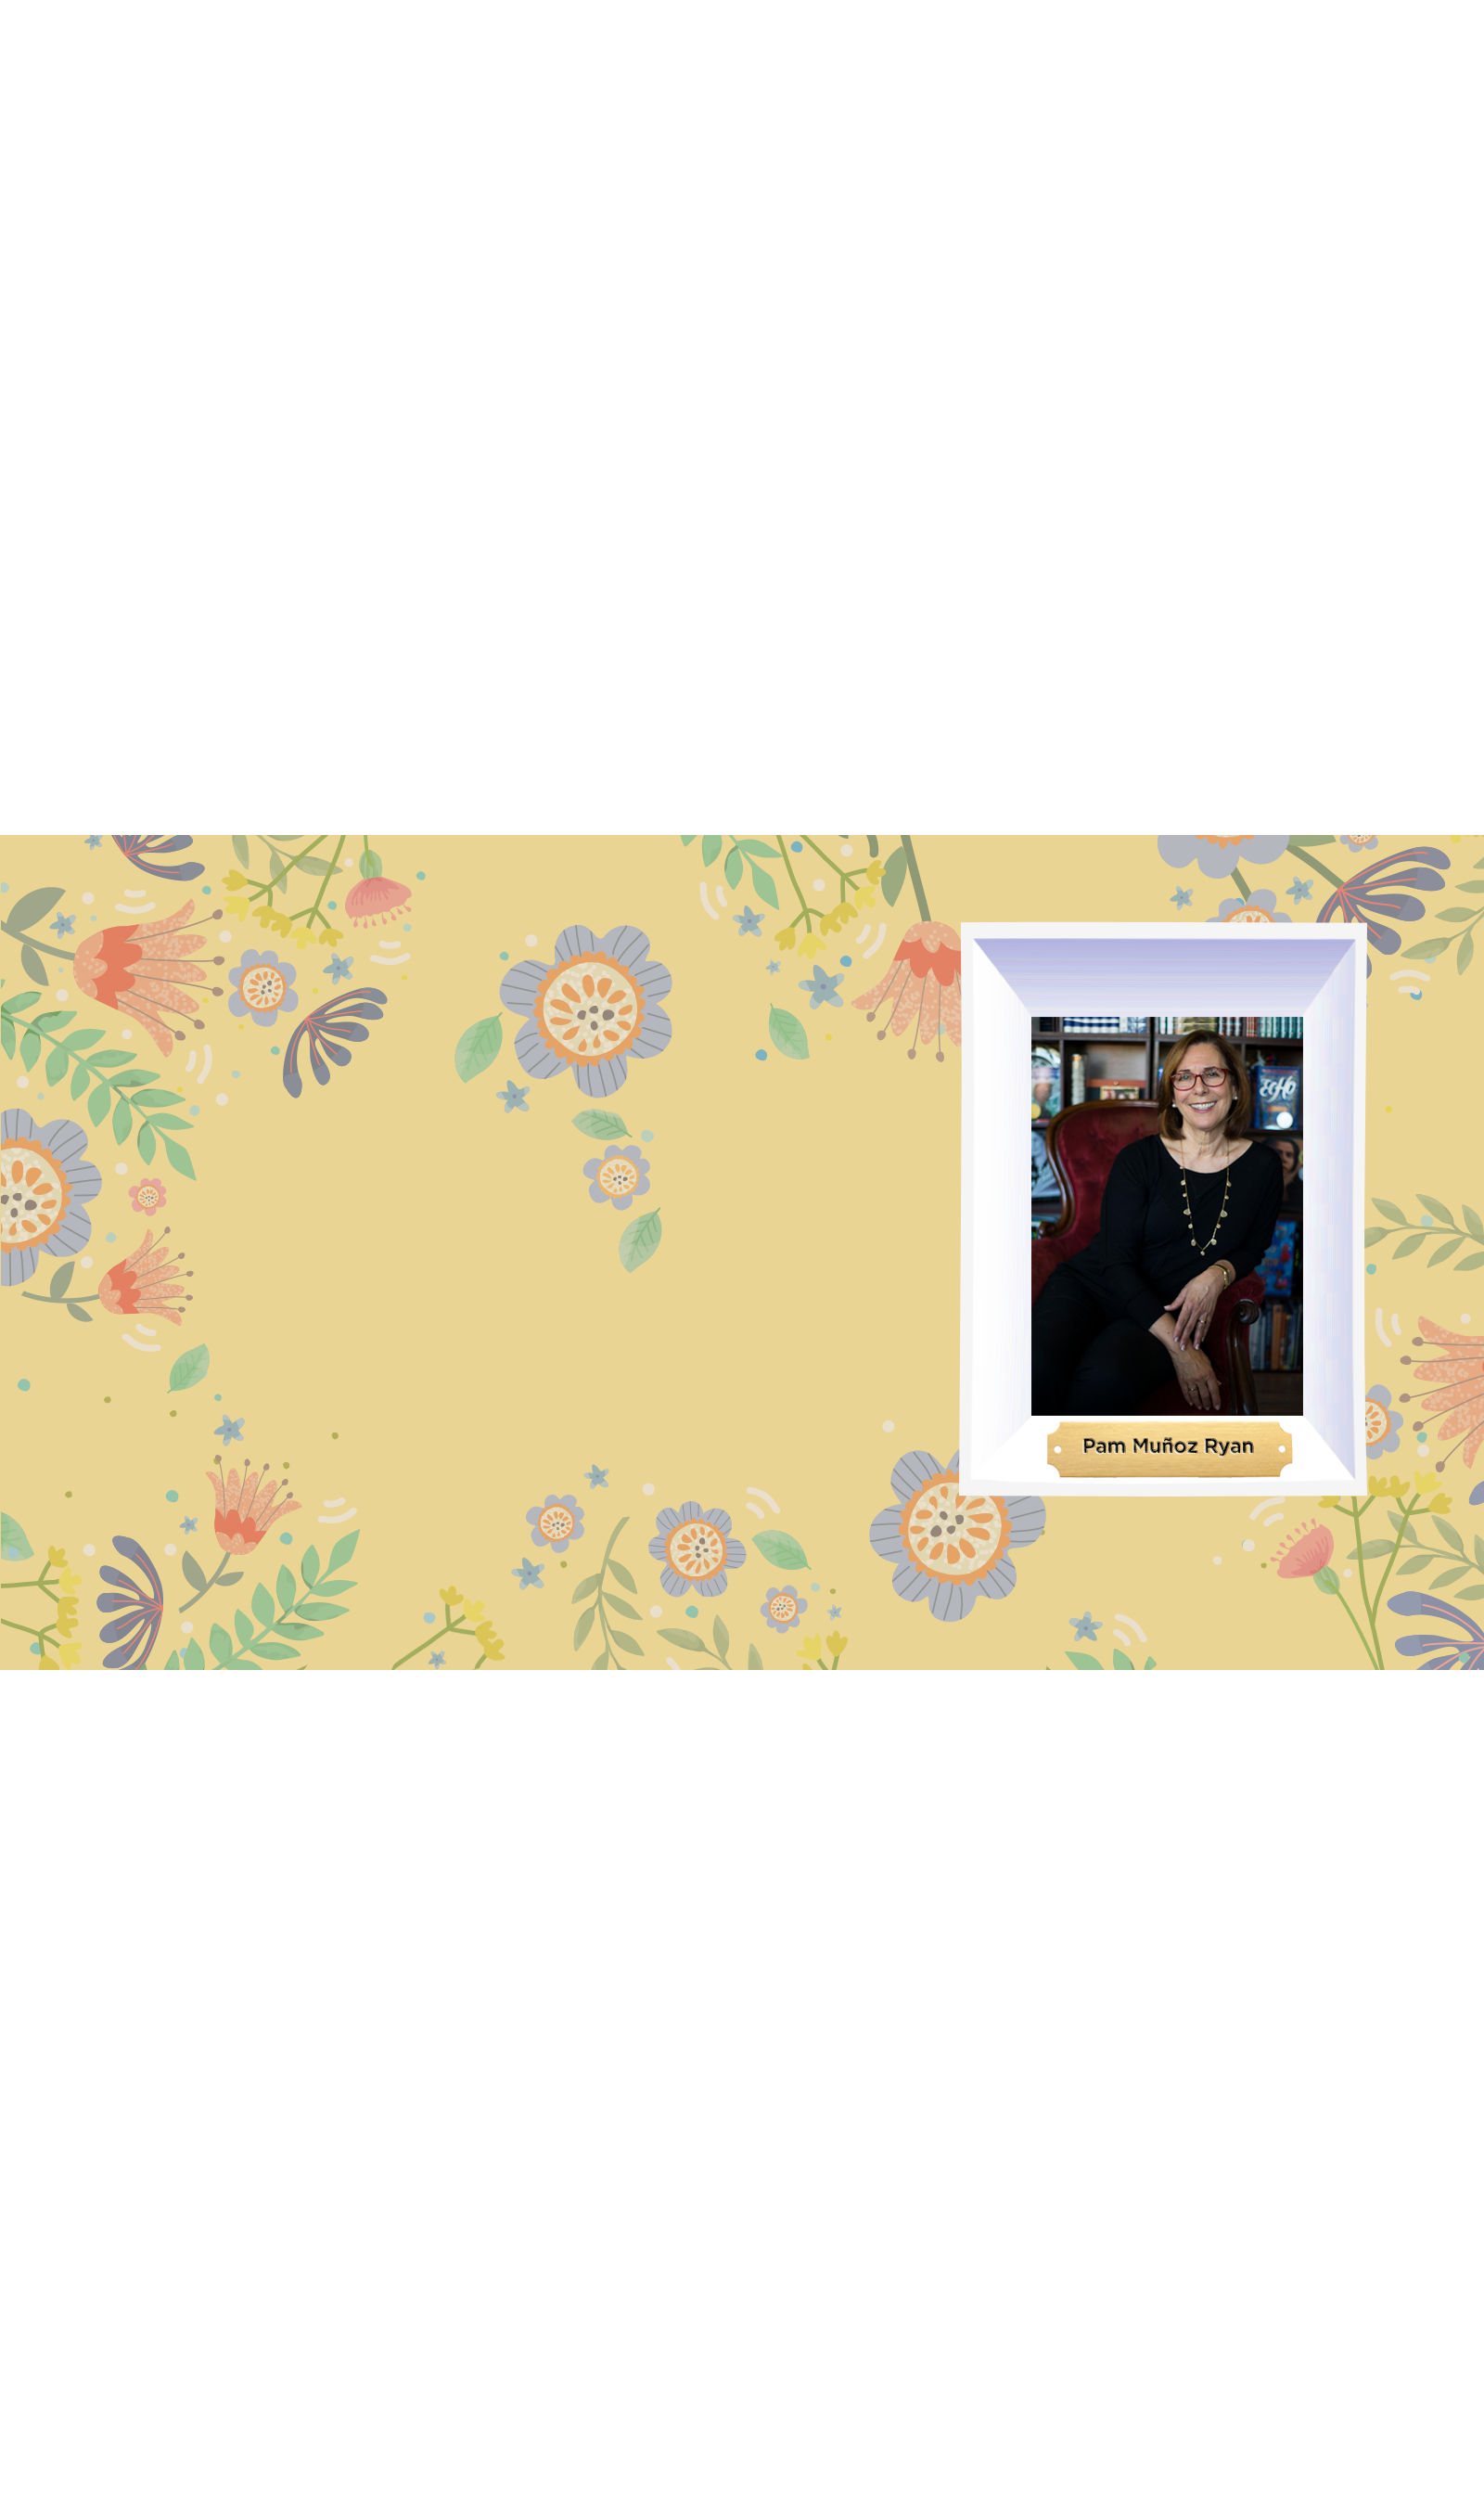 Women's History Month<br/> Pam Muñoz Ryan